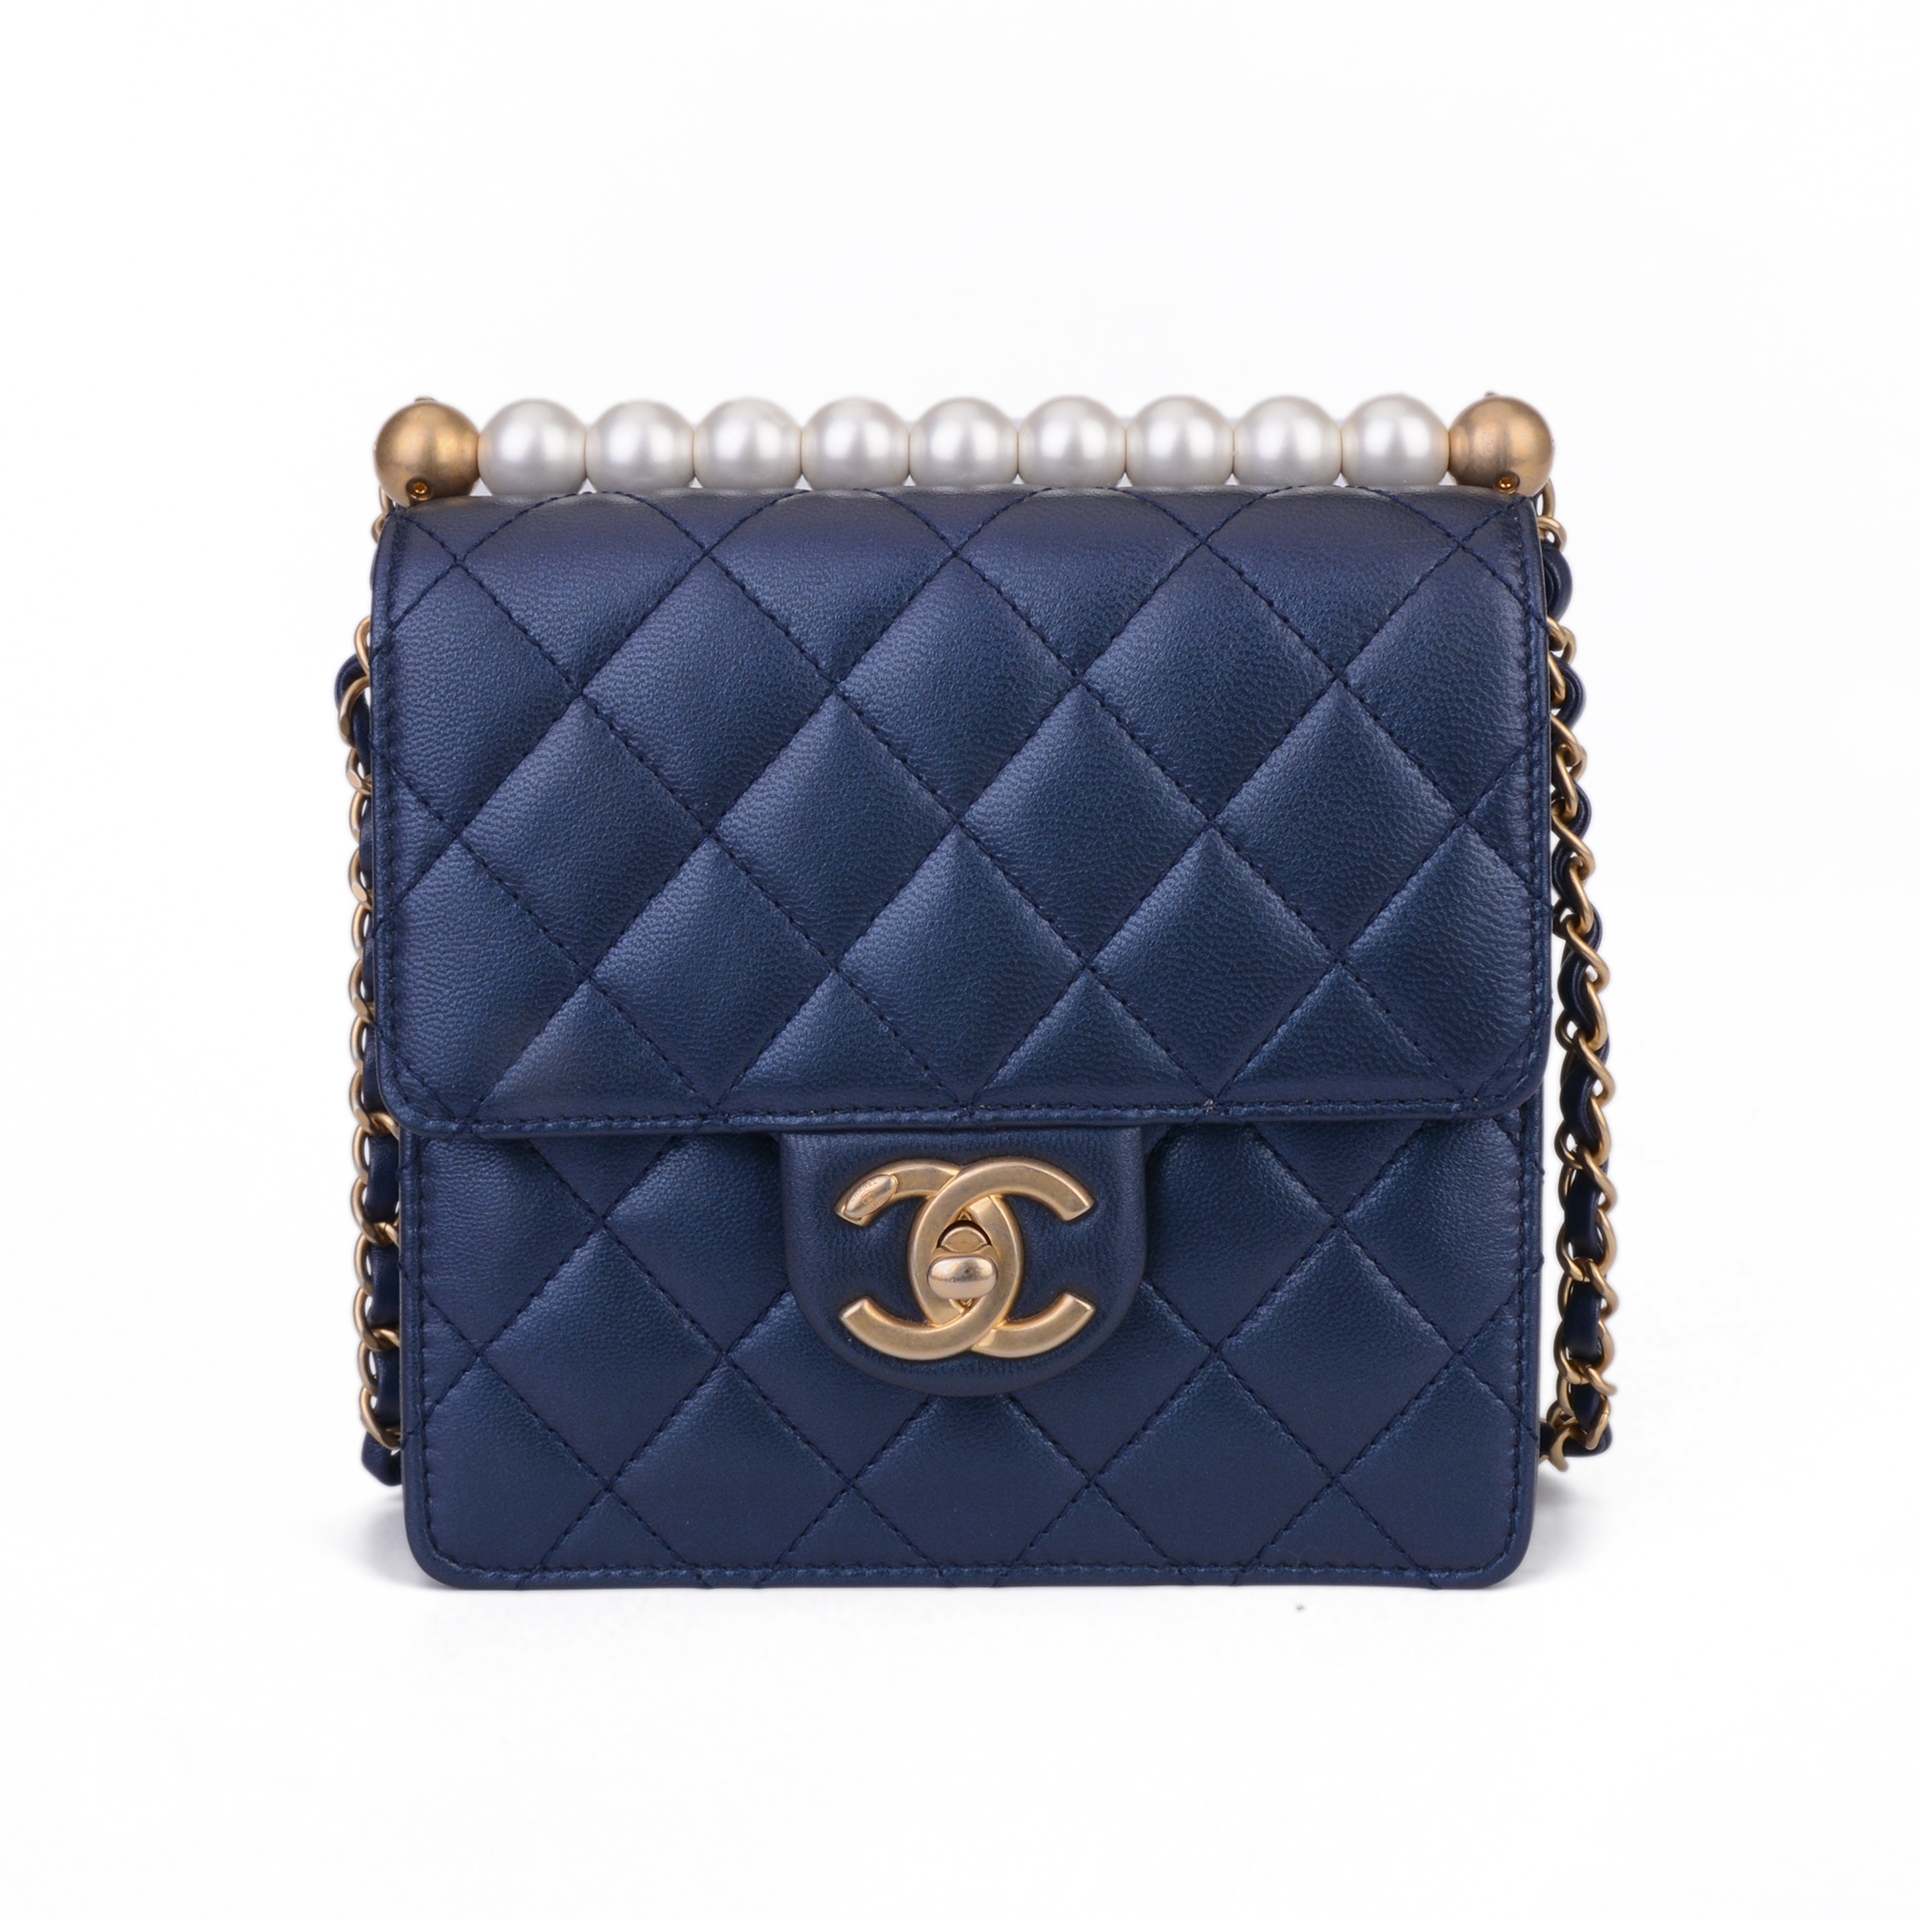 CHANEL香奈儿 菱格珍珠经典蓝色链条包